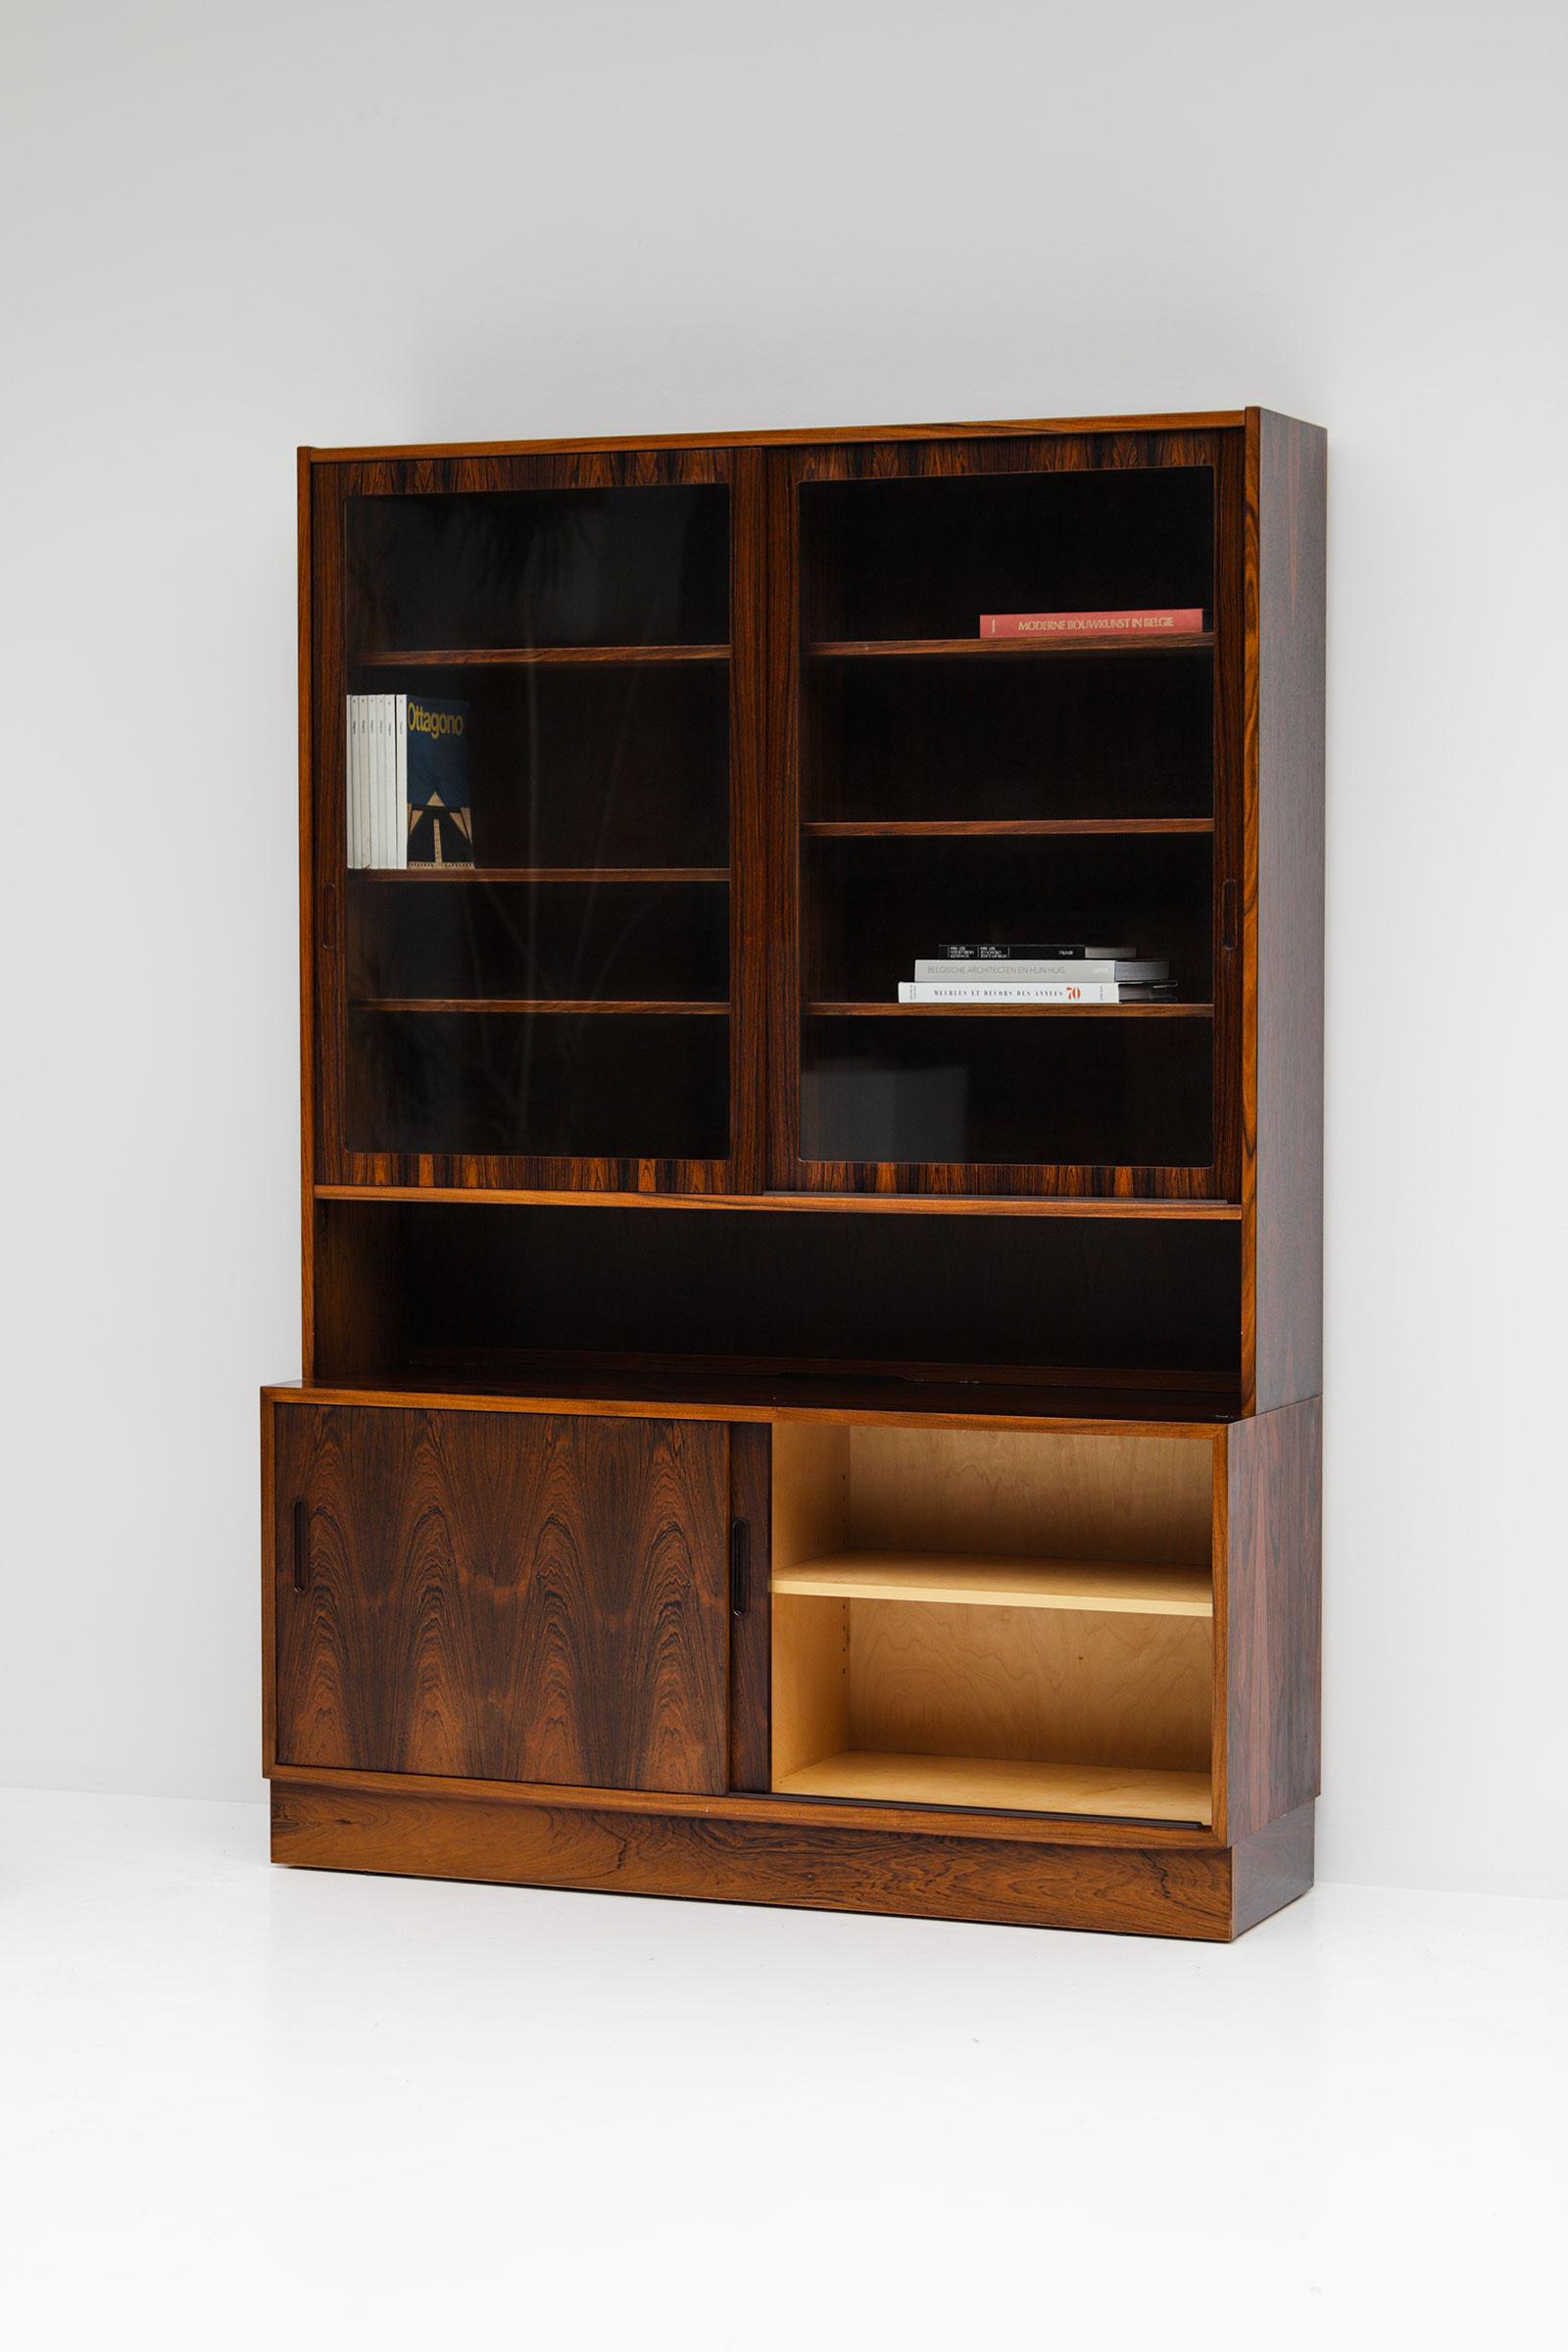 cabinet by Erik Brouer for Mobelfabrik 1960image 3